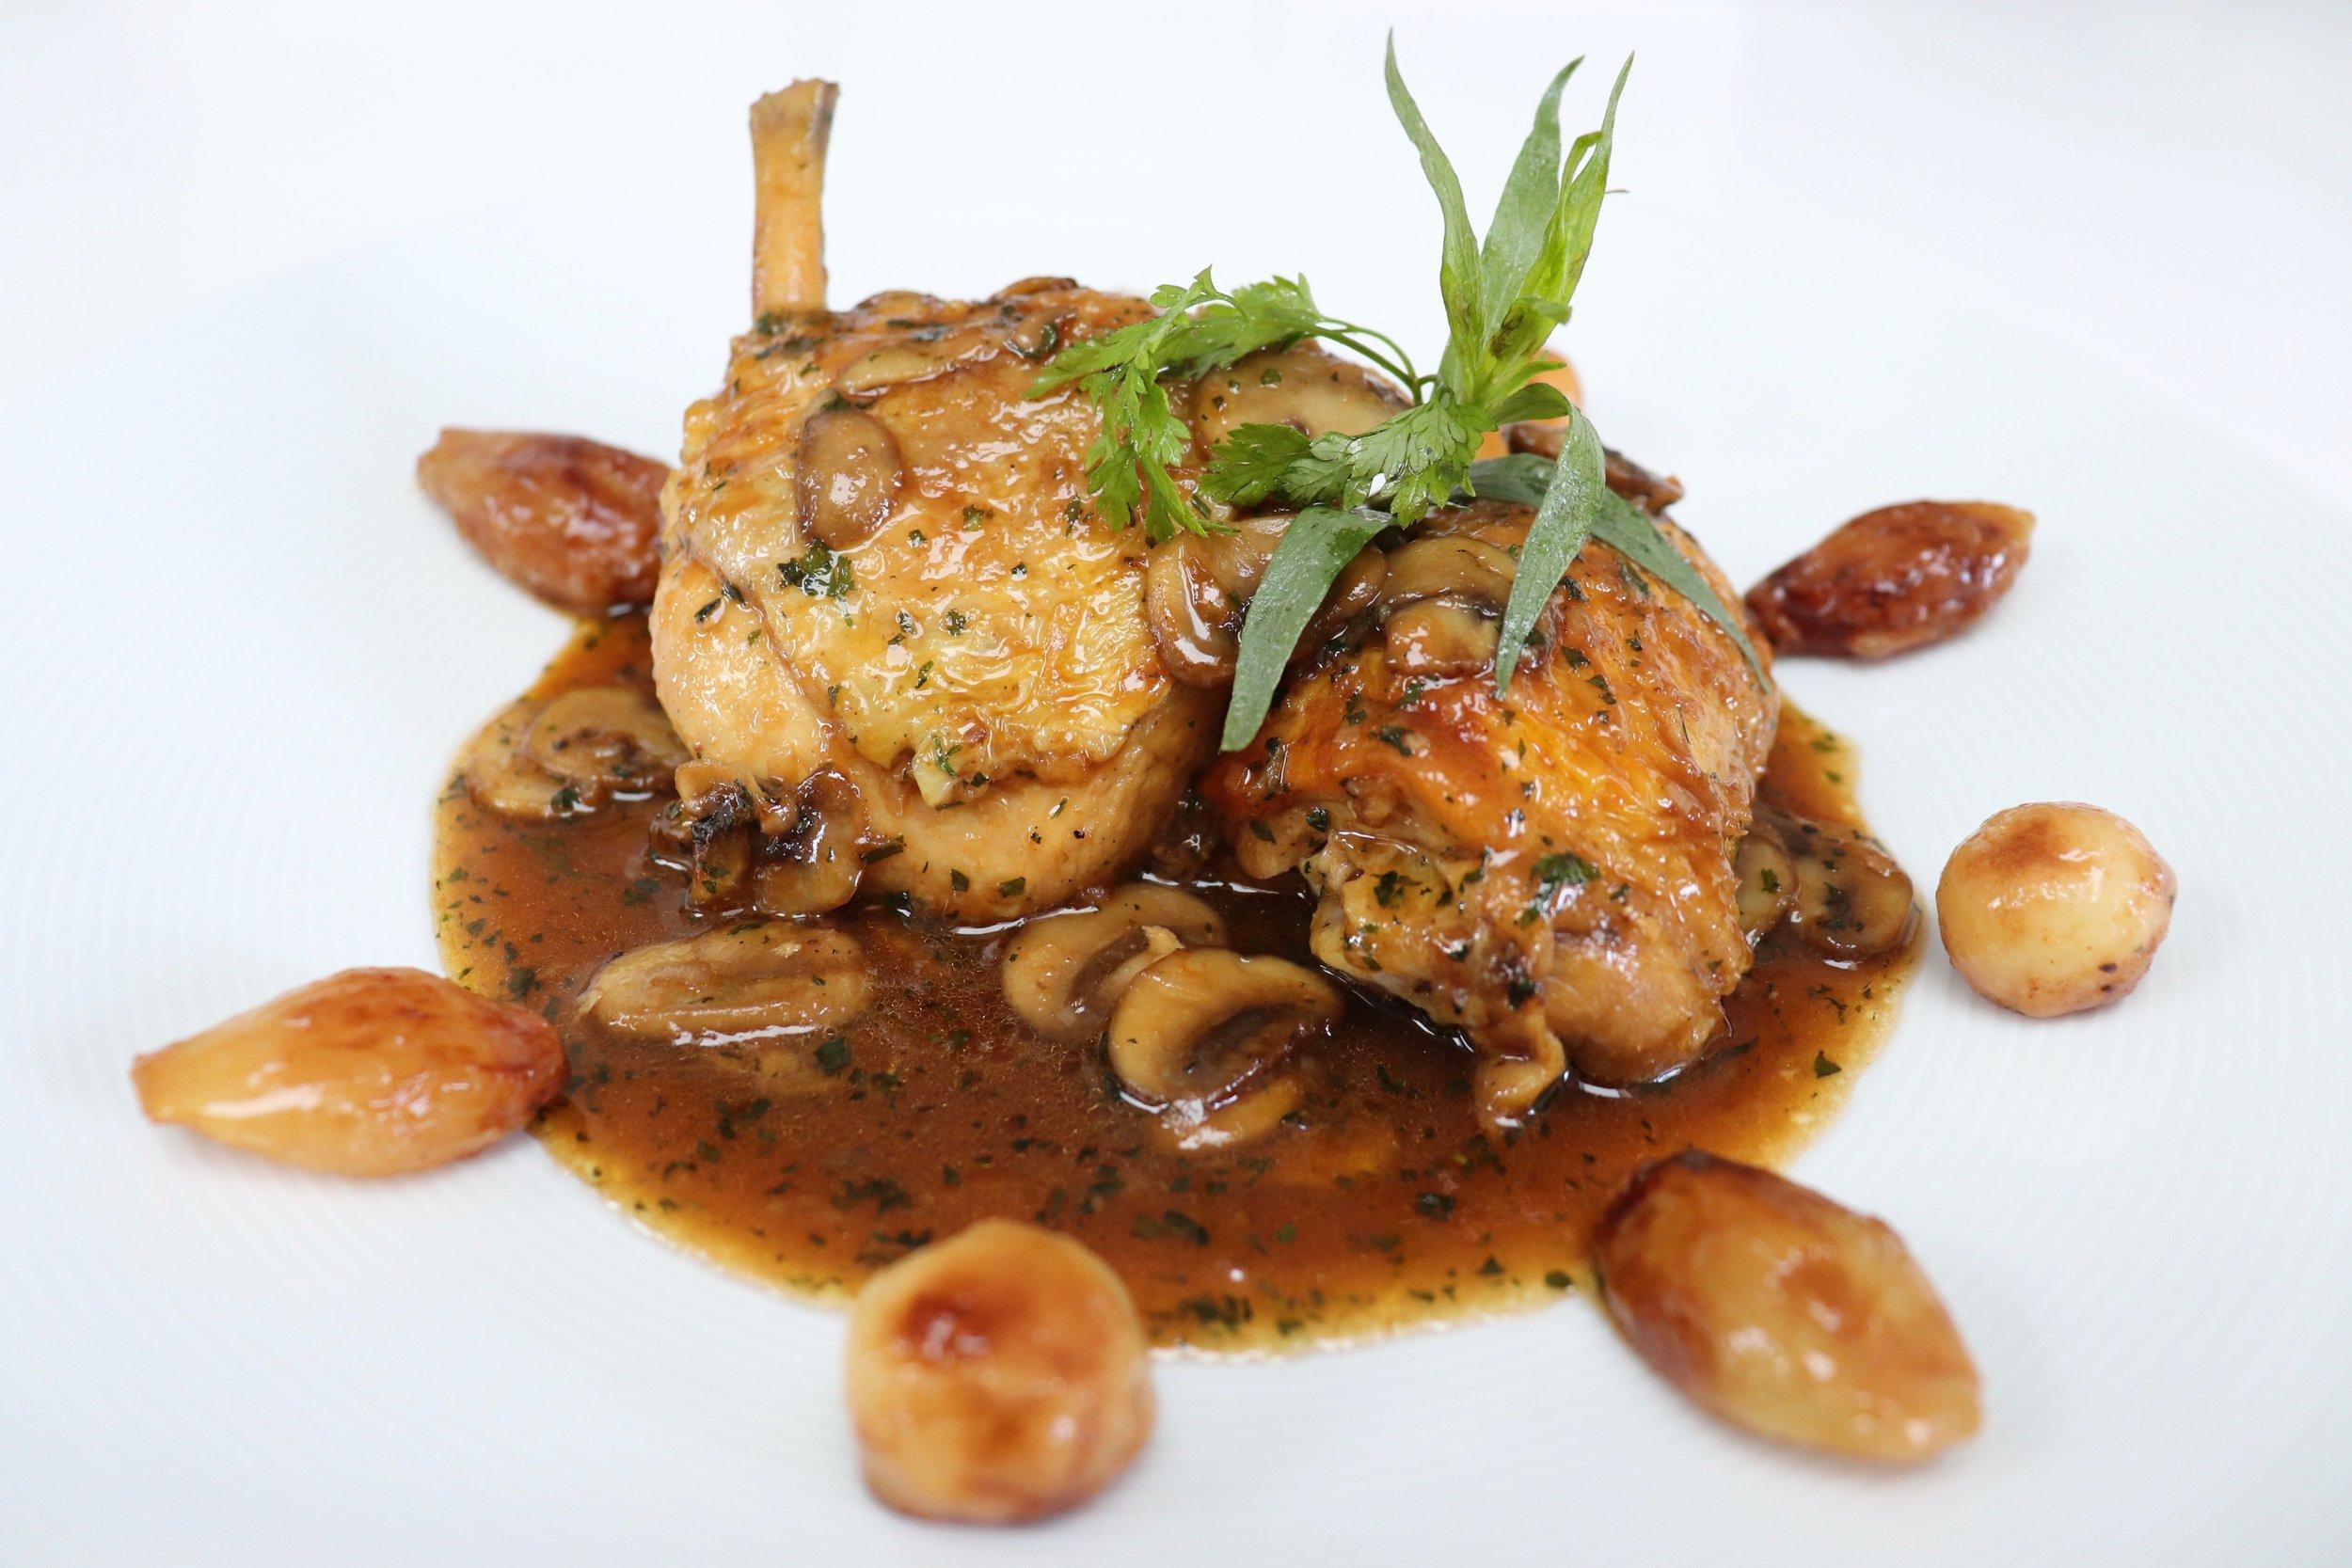 Pan-fried chicken Champeaux